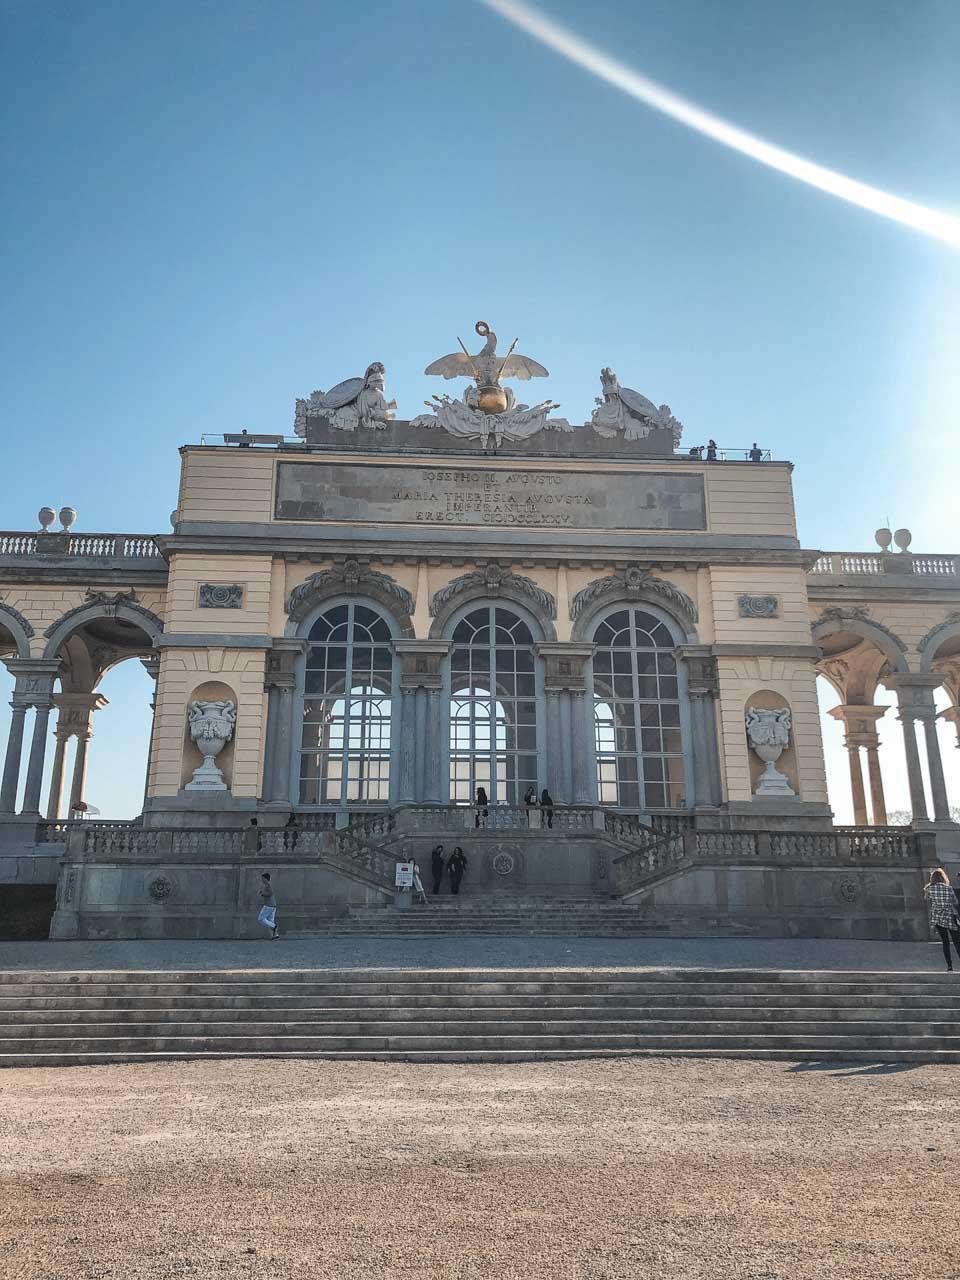 Café Gloriette in Schönbrunn Palace in Vienna, Austria